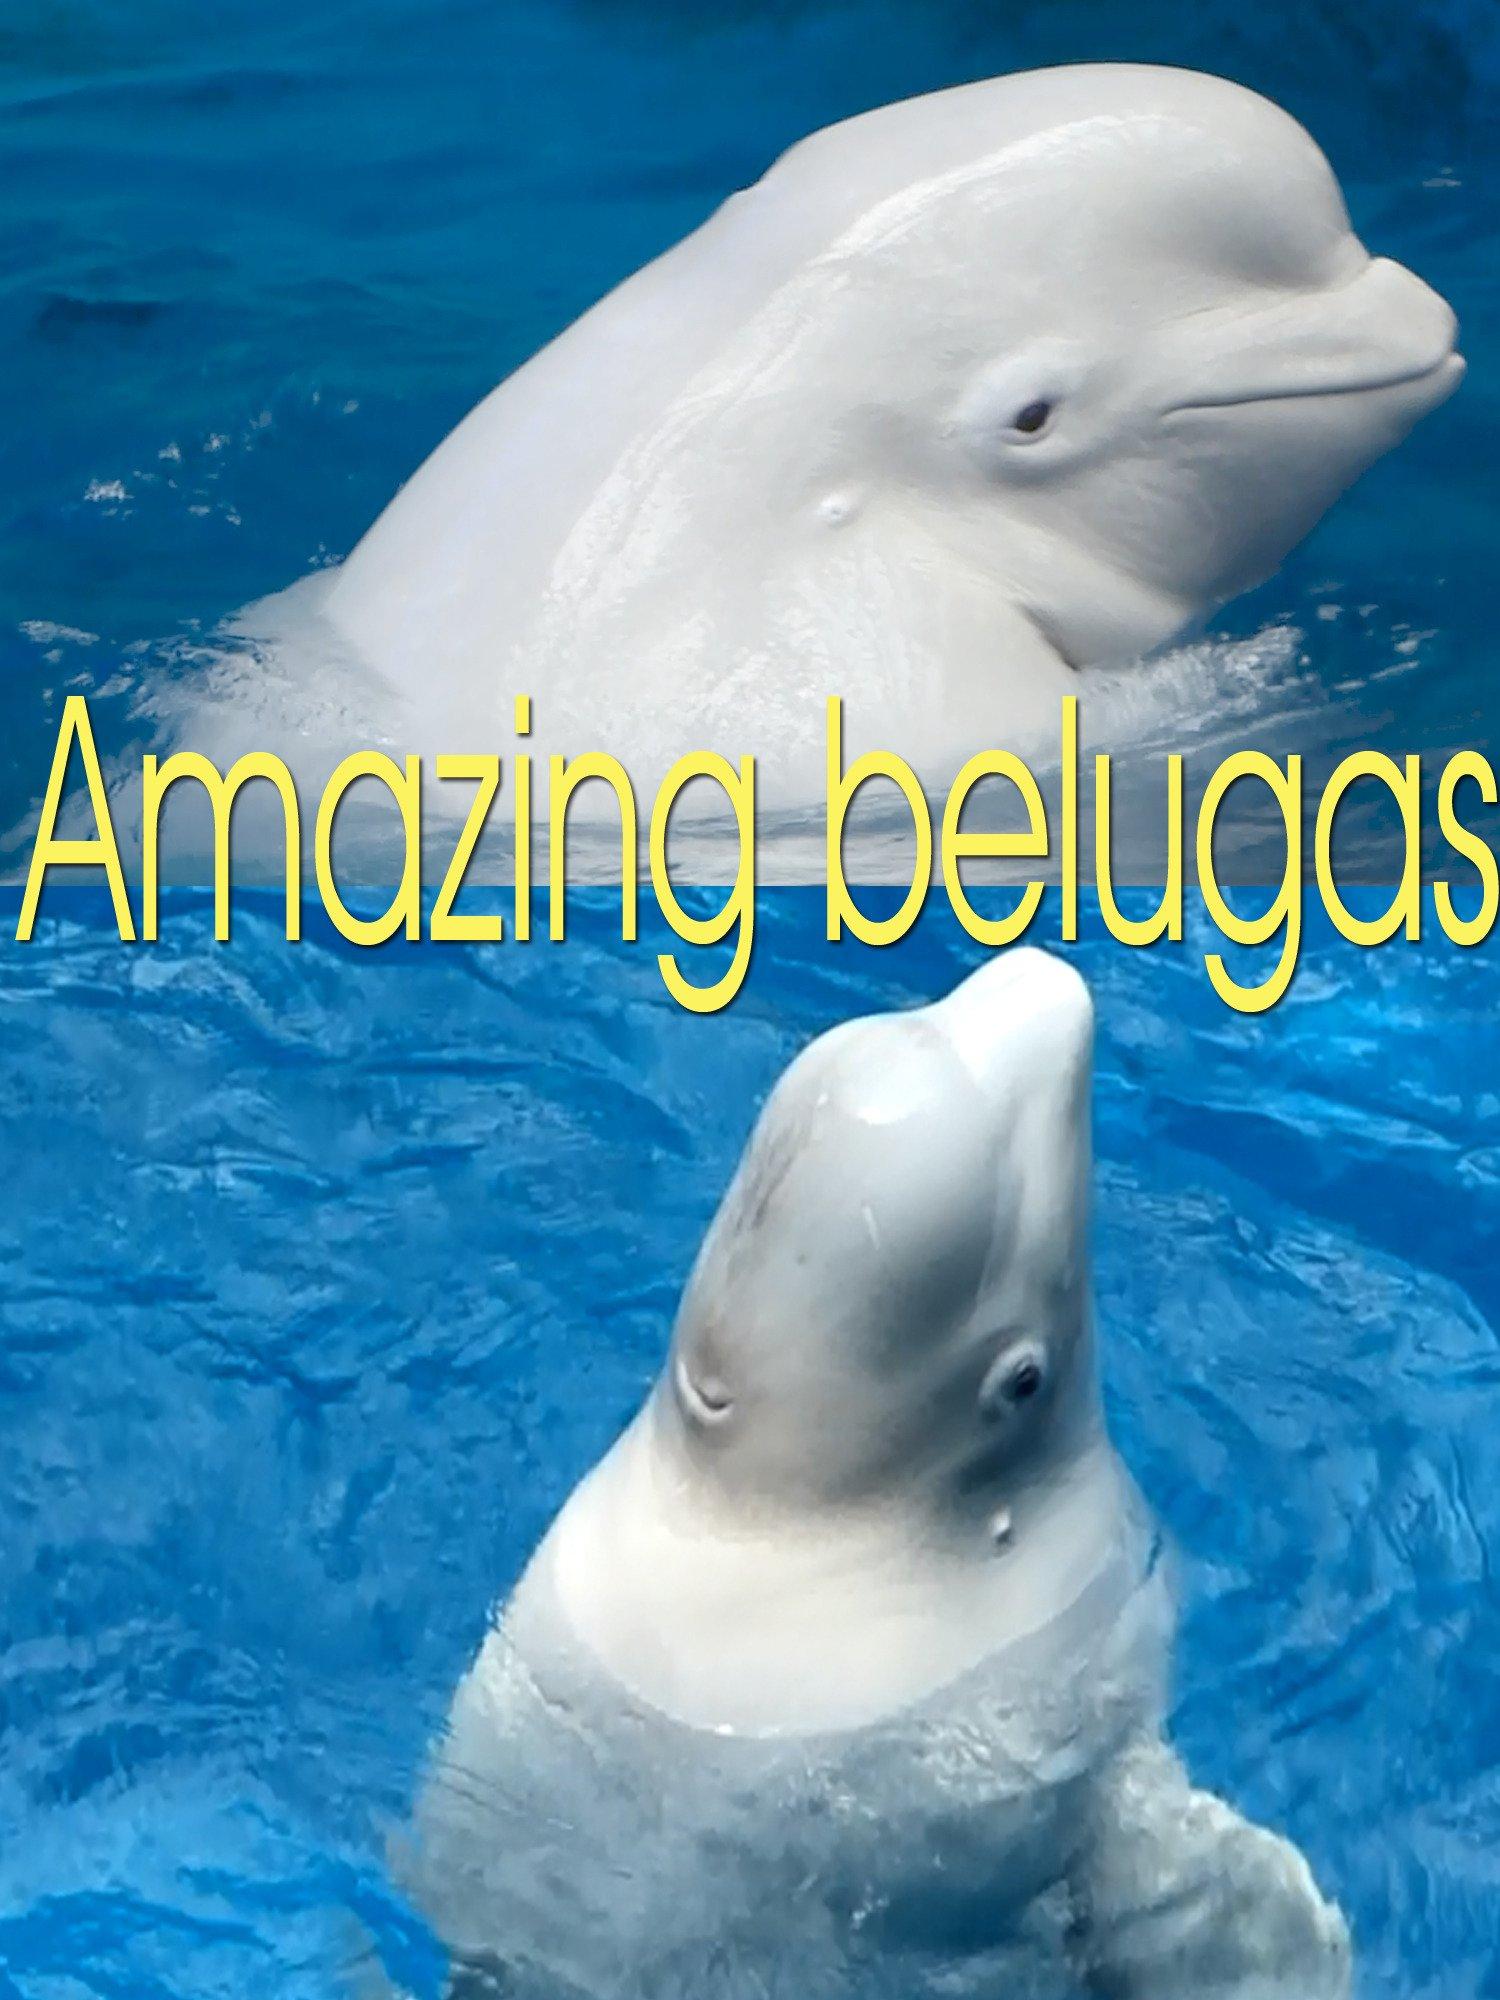 Amazing belugas